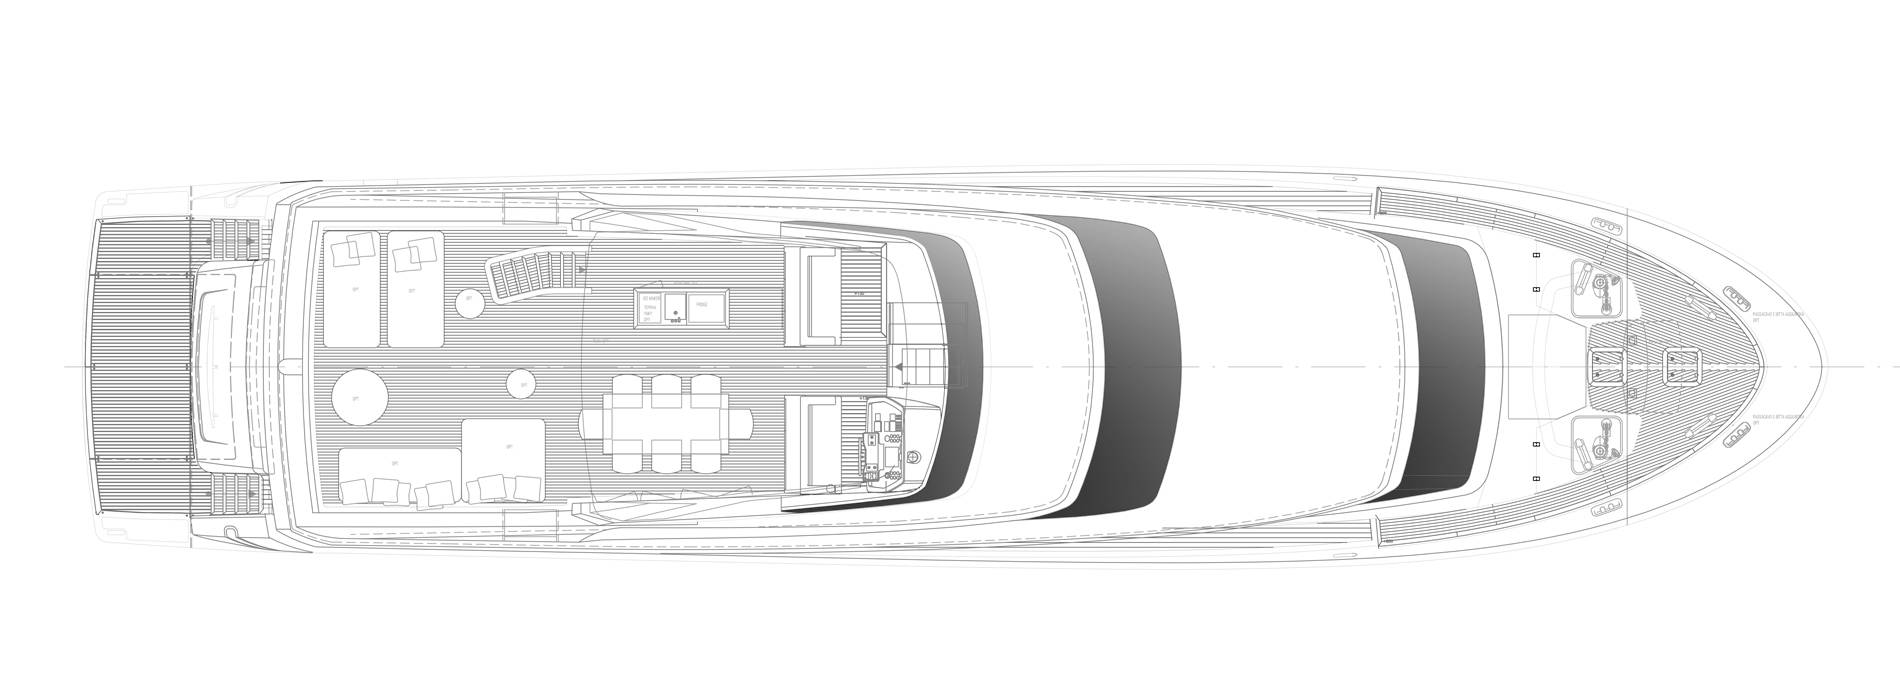 Sanlorenzo Yachts SL96-631 Flying bridge